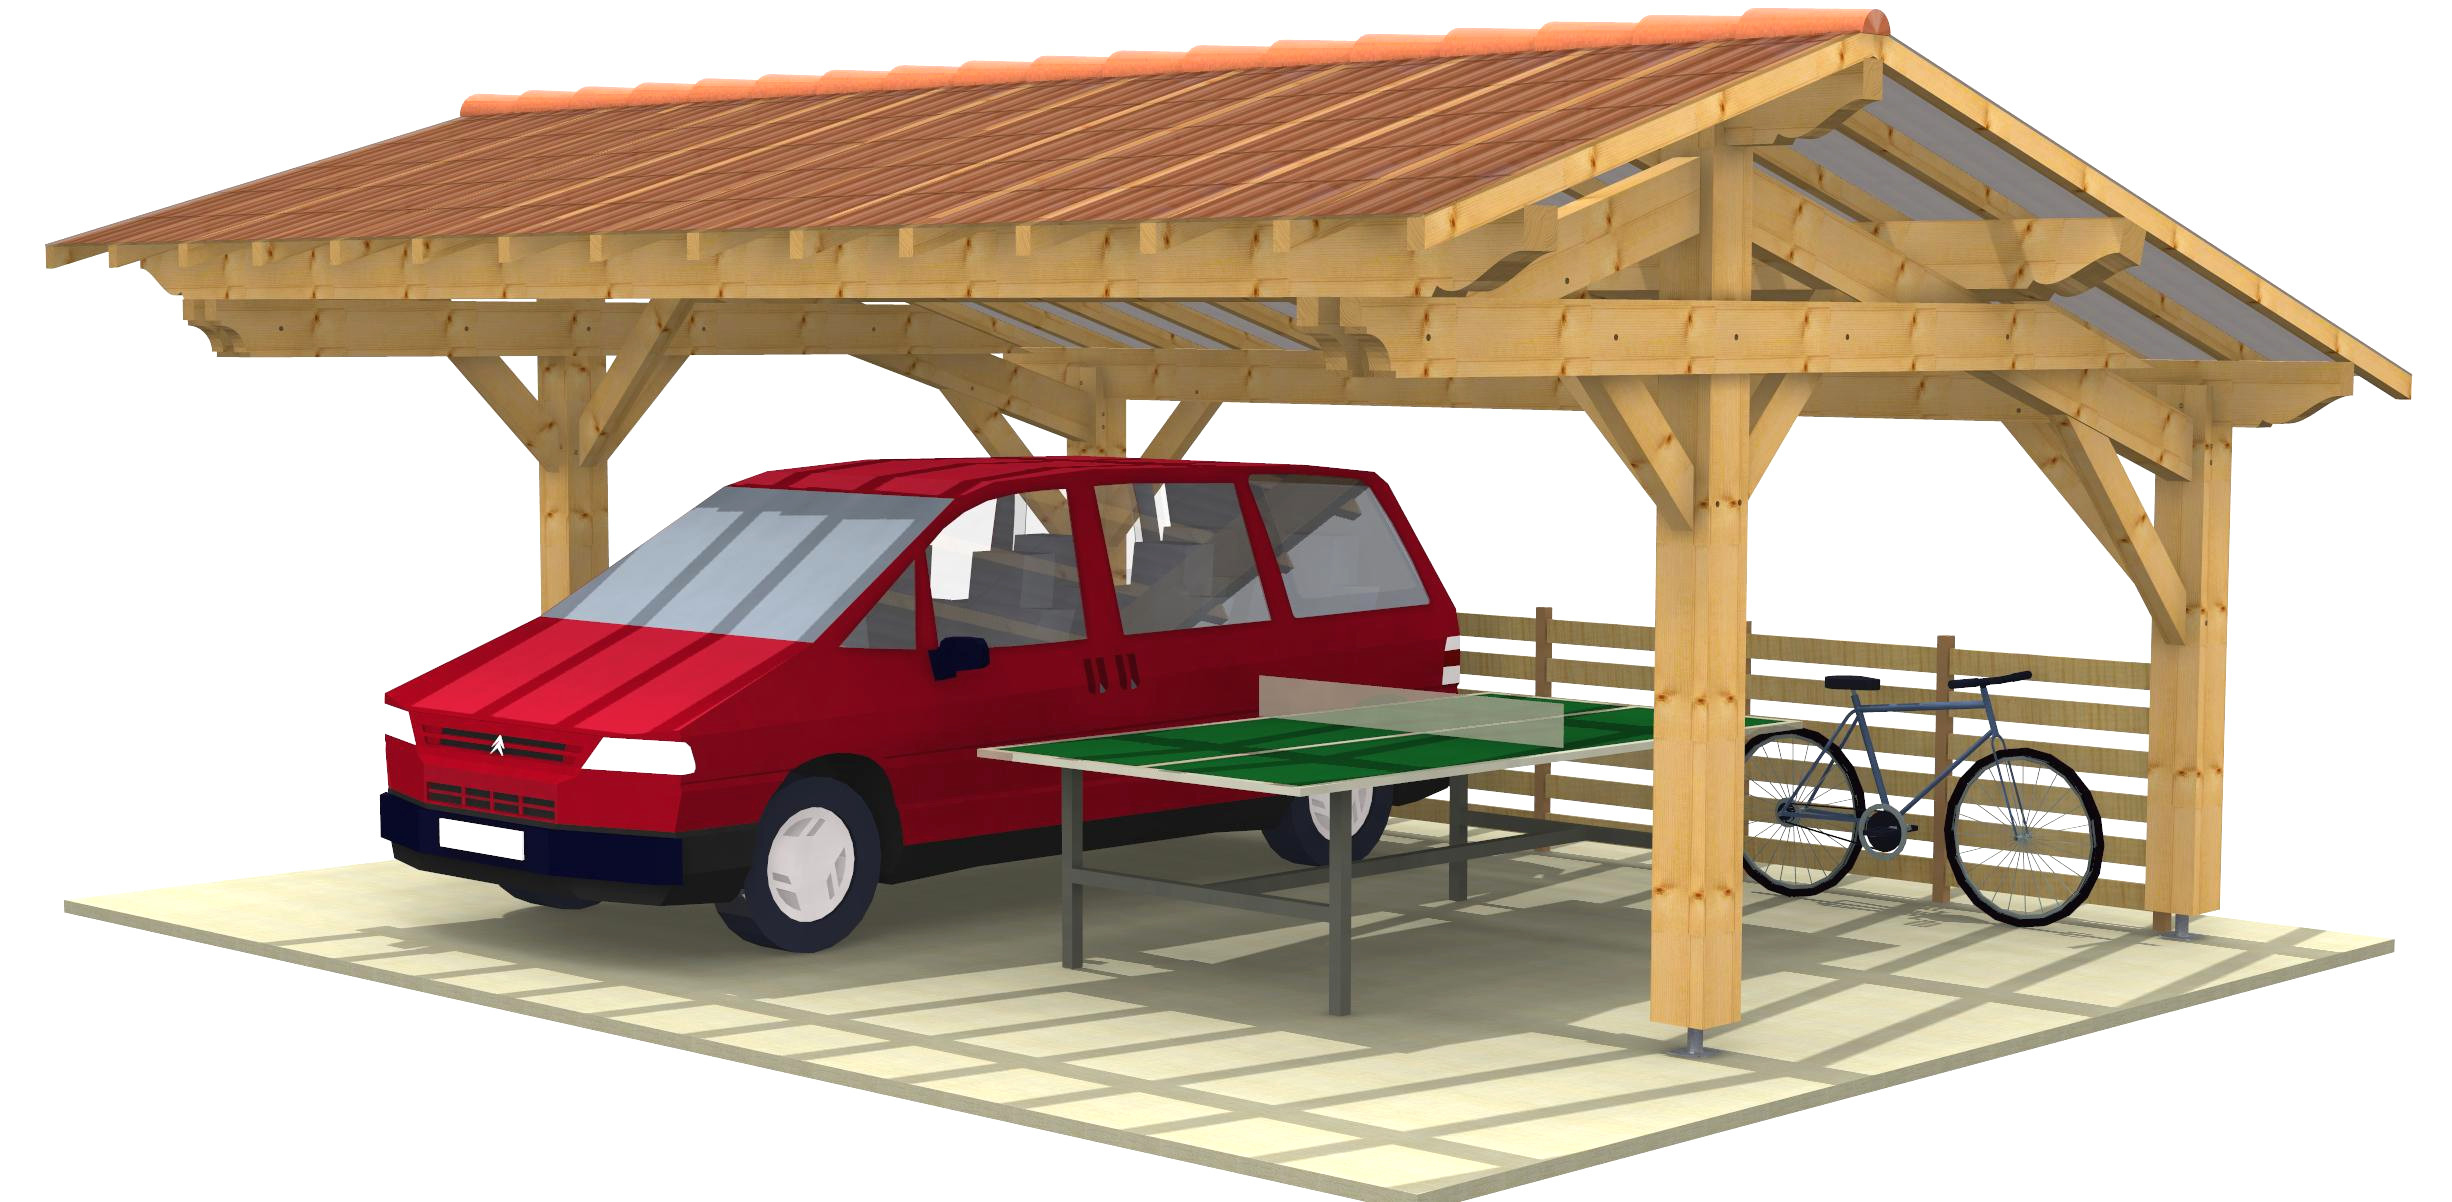 Carport Adoss Pour Camping Car Le Carport Campingcar encequiconcerne Abri Camping Car Brico Dépôt